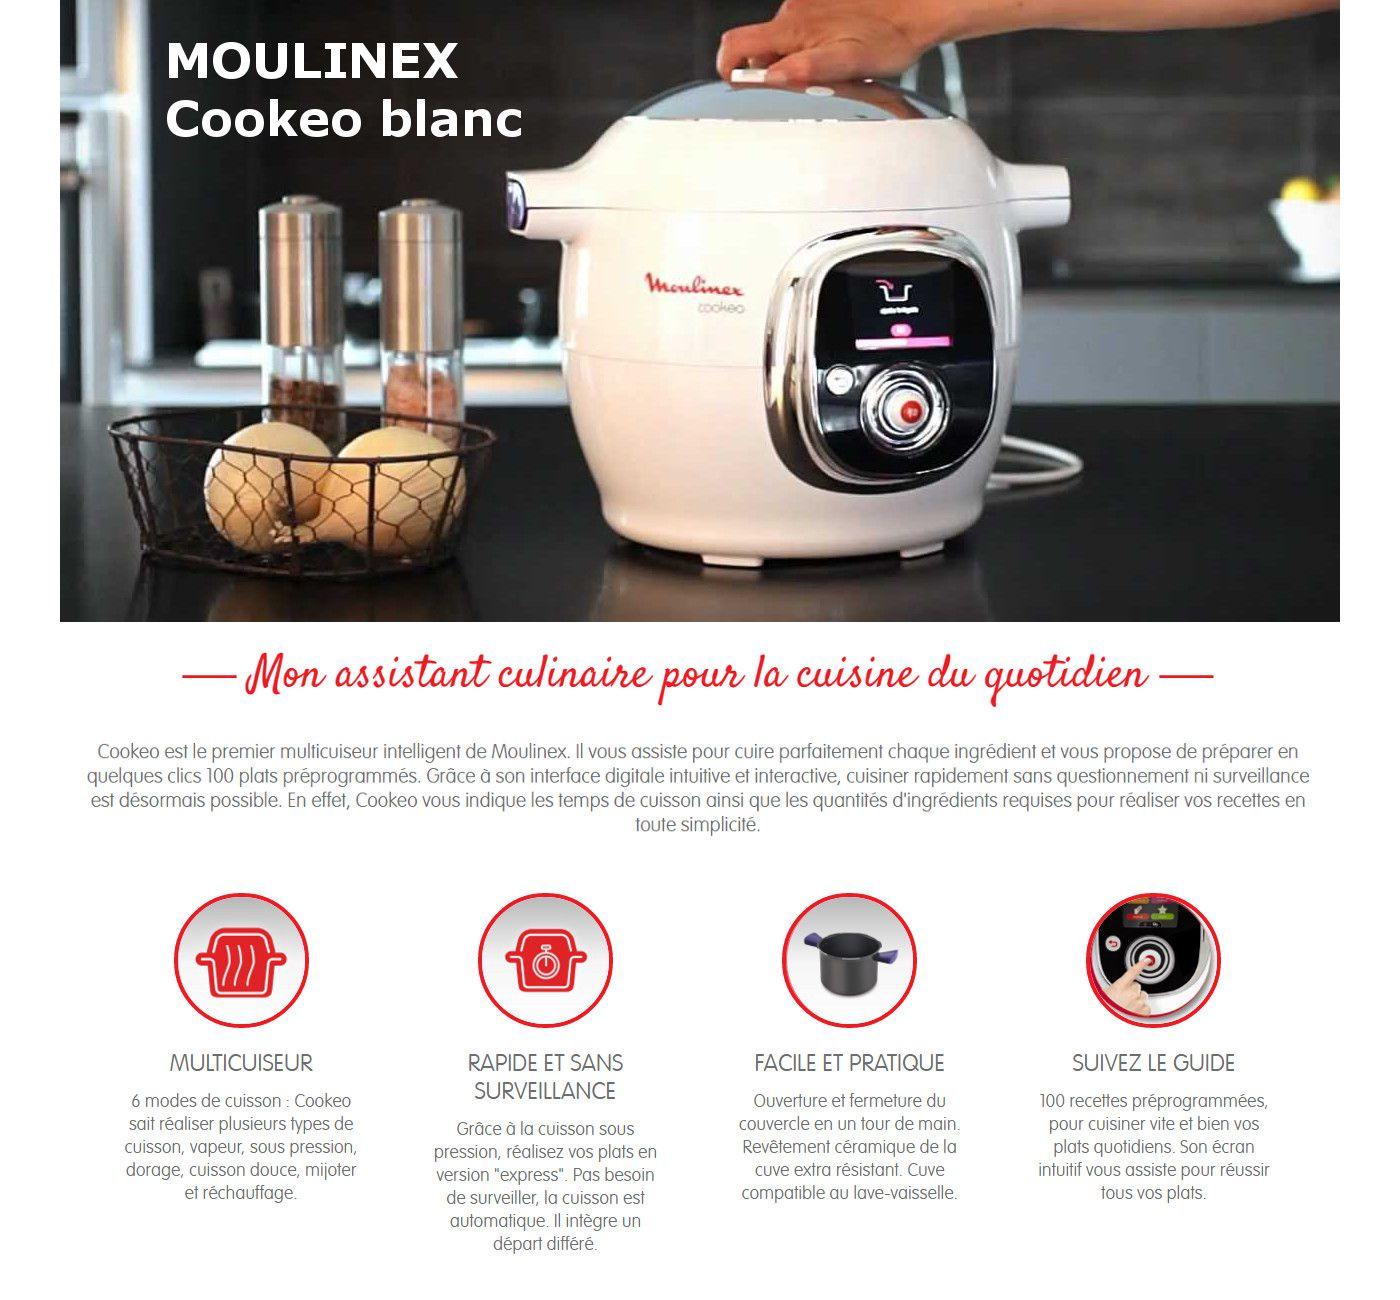 moulinex multicuiseur intelligent cookeo 100 recettes ce704110 achat vente multicuiseur. Black Bedroom Furniture Sets. Home Design Ideas